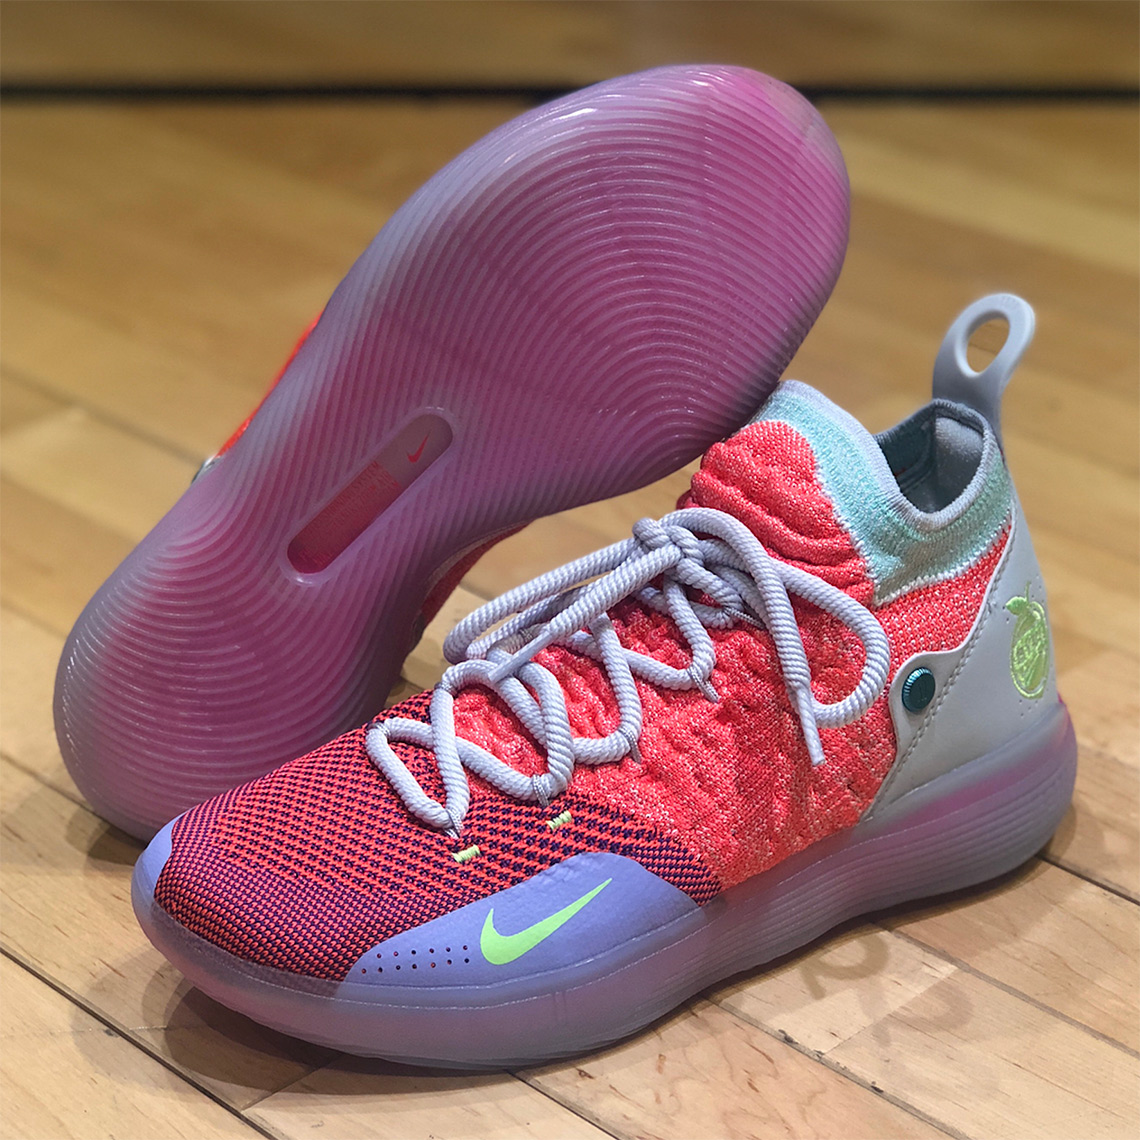 brand new b24a7 75859 Nike KD 11